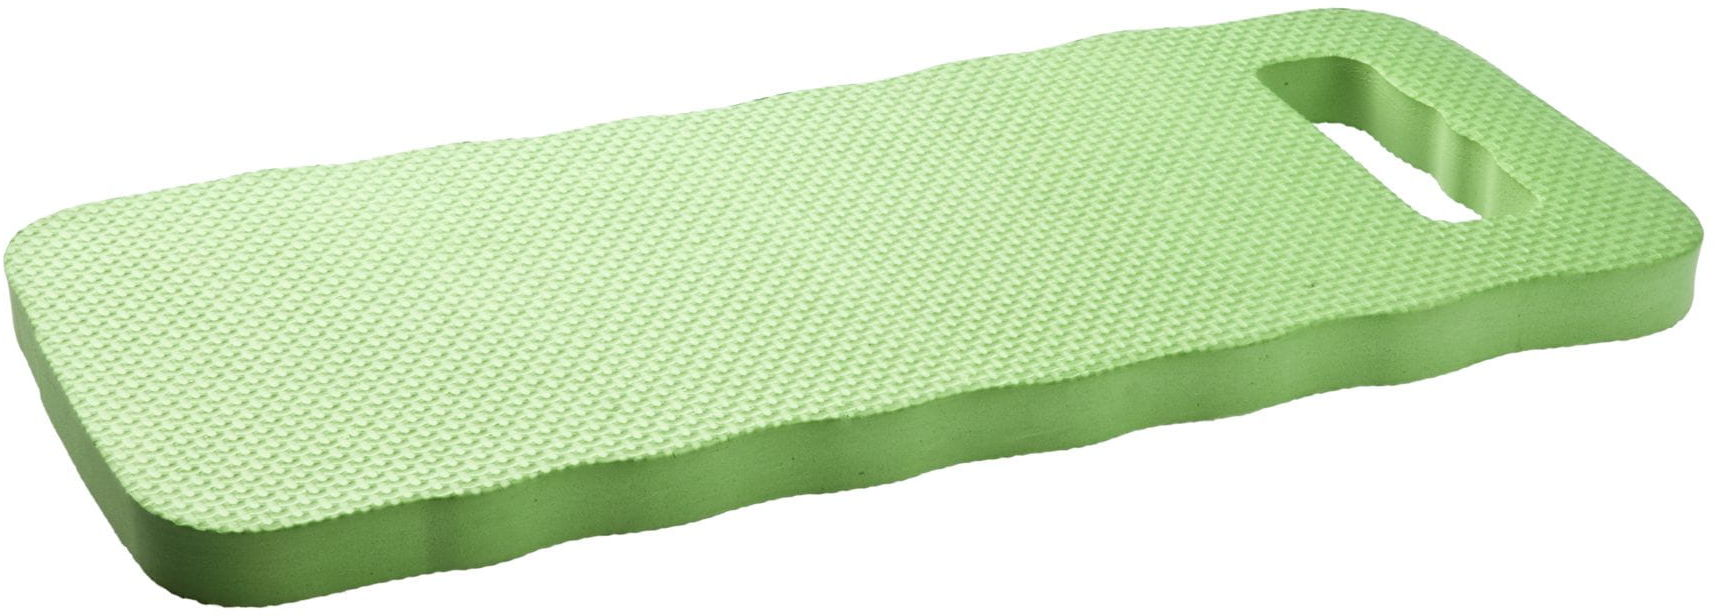 Podkładka pod kolana 40x17 cm, zielona